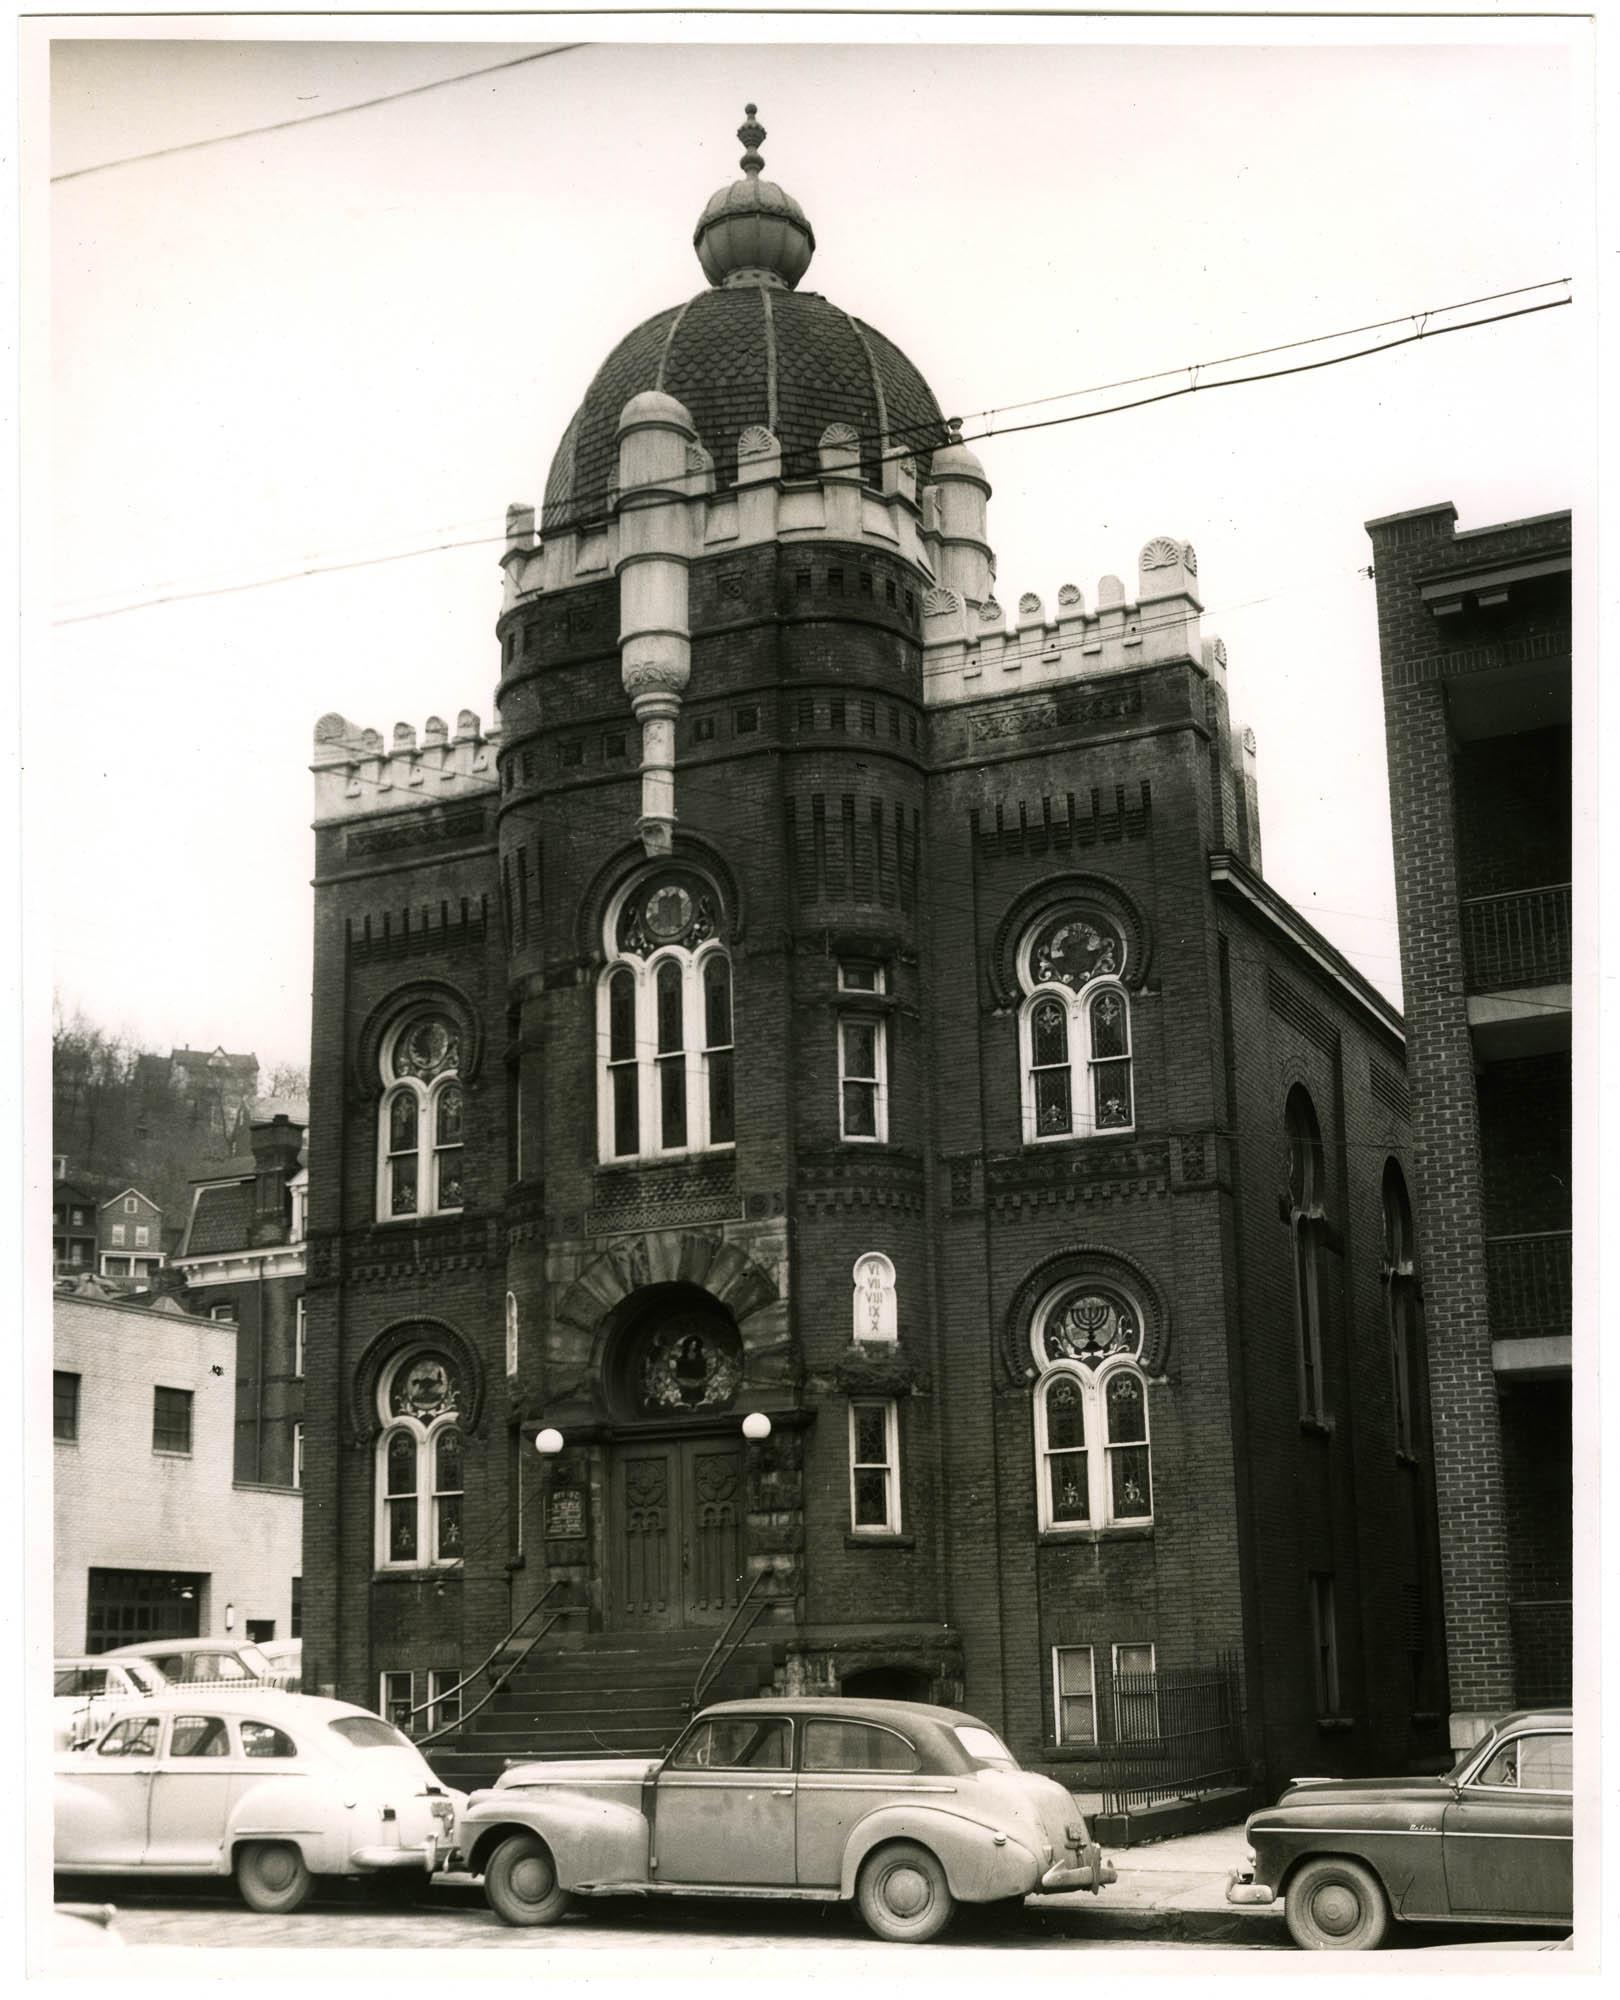 [Eoff St. Temple, Wheeling, W. Va.]